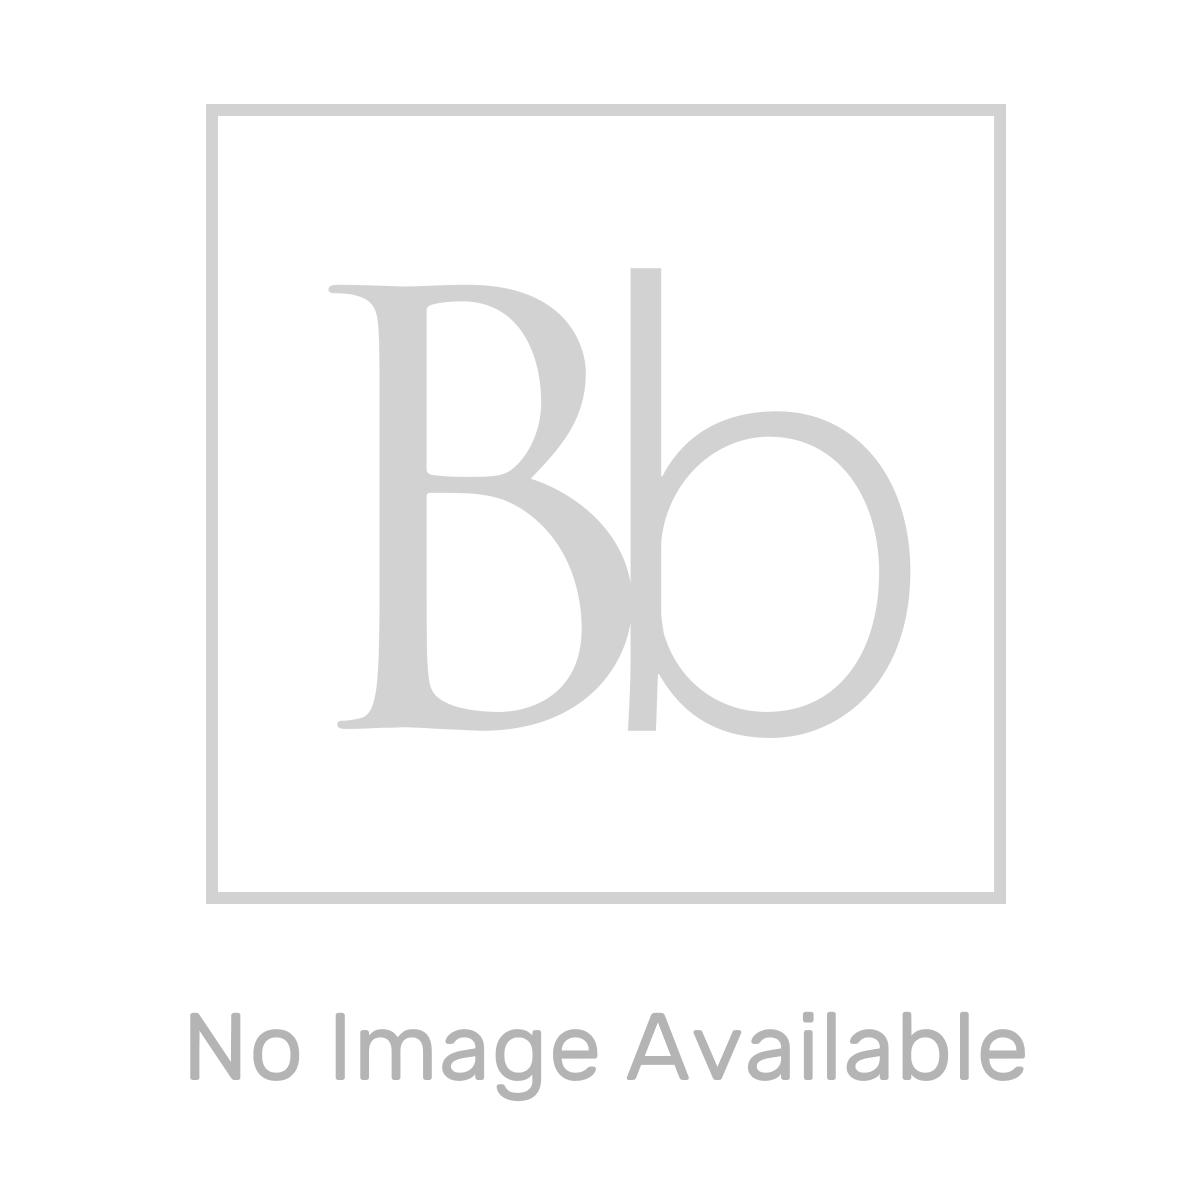 RAK Compact Shower Suite with Pacific Single Door Quadrant Shower Enclosure